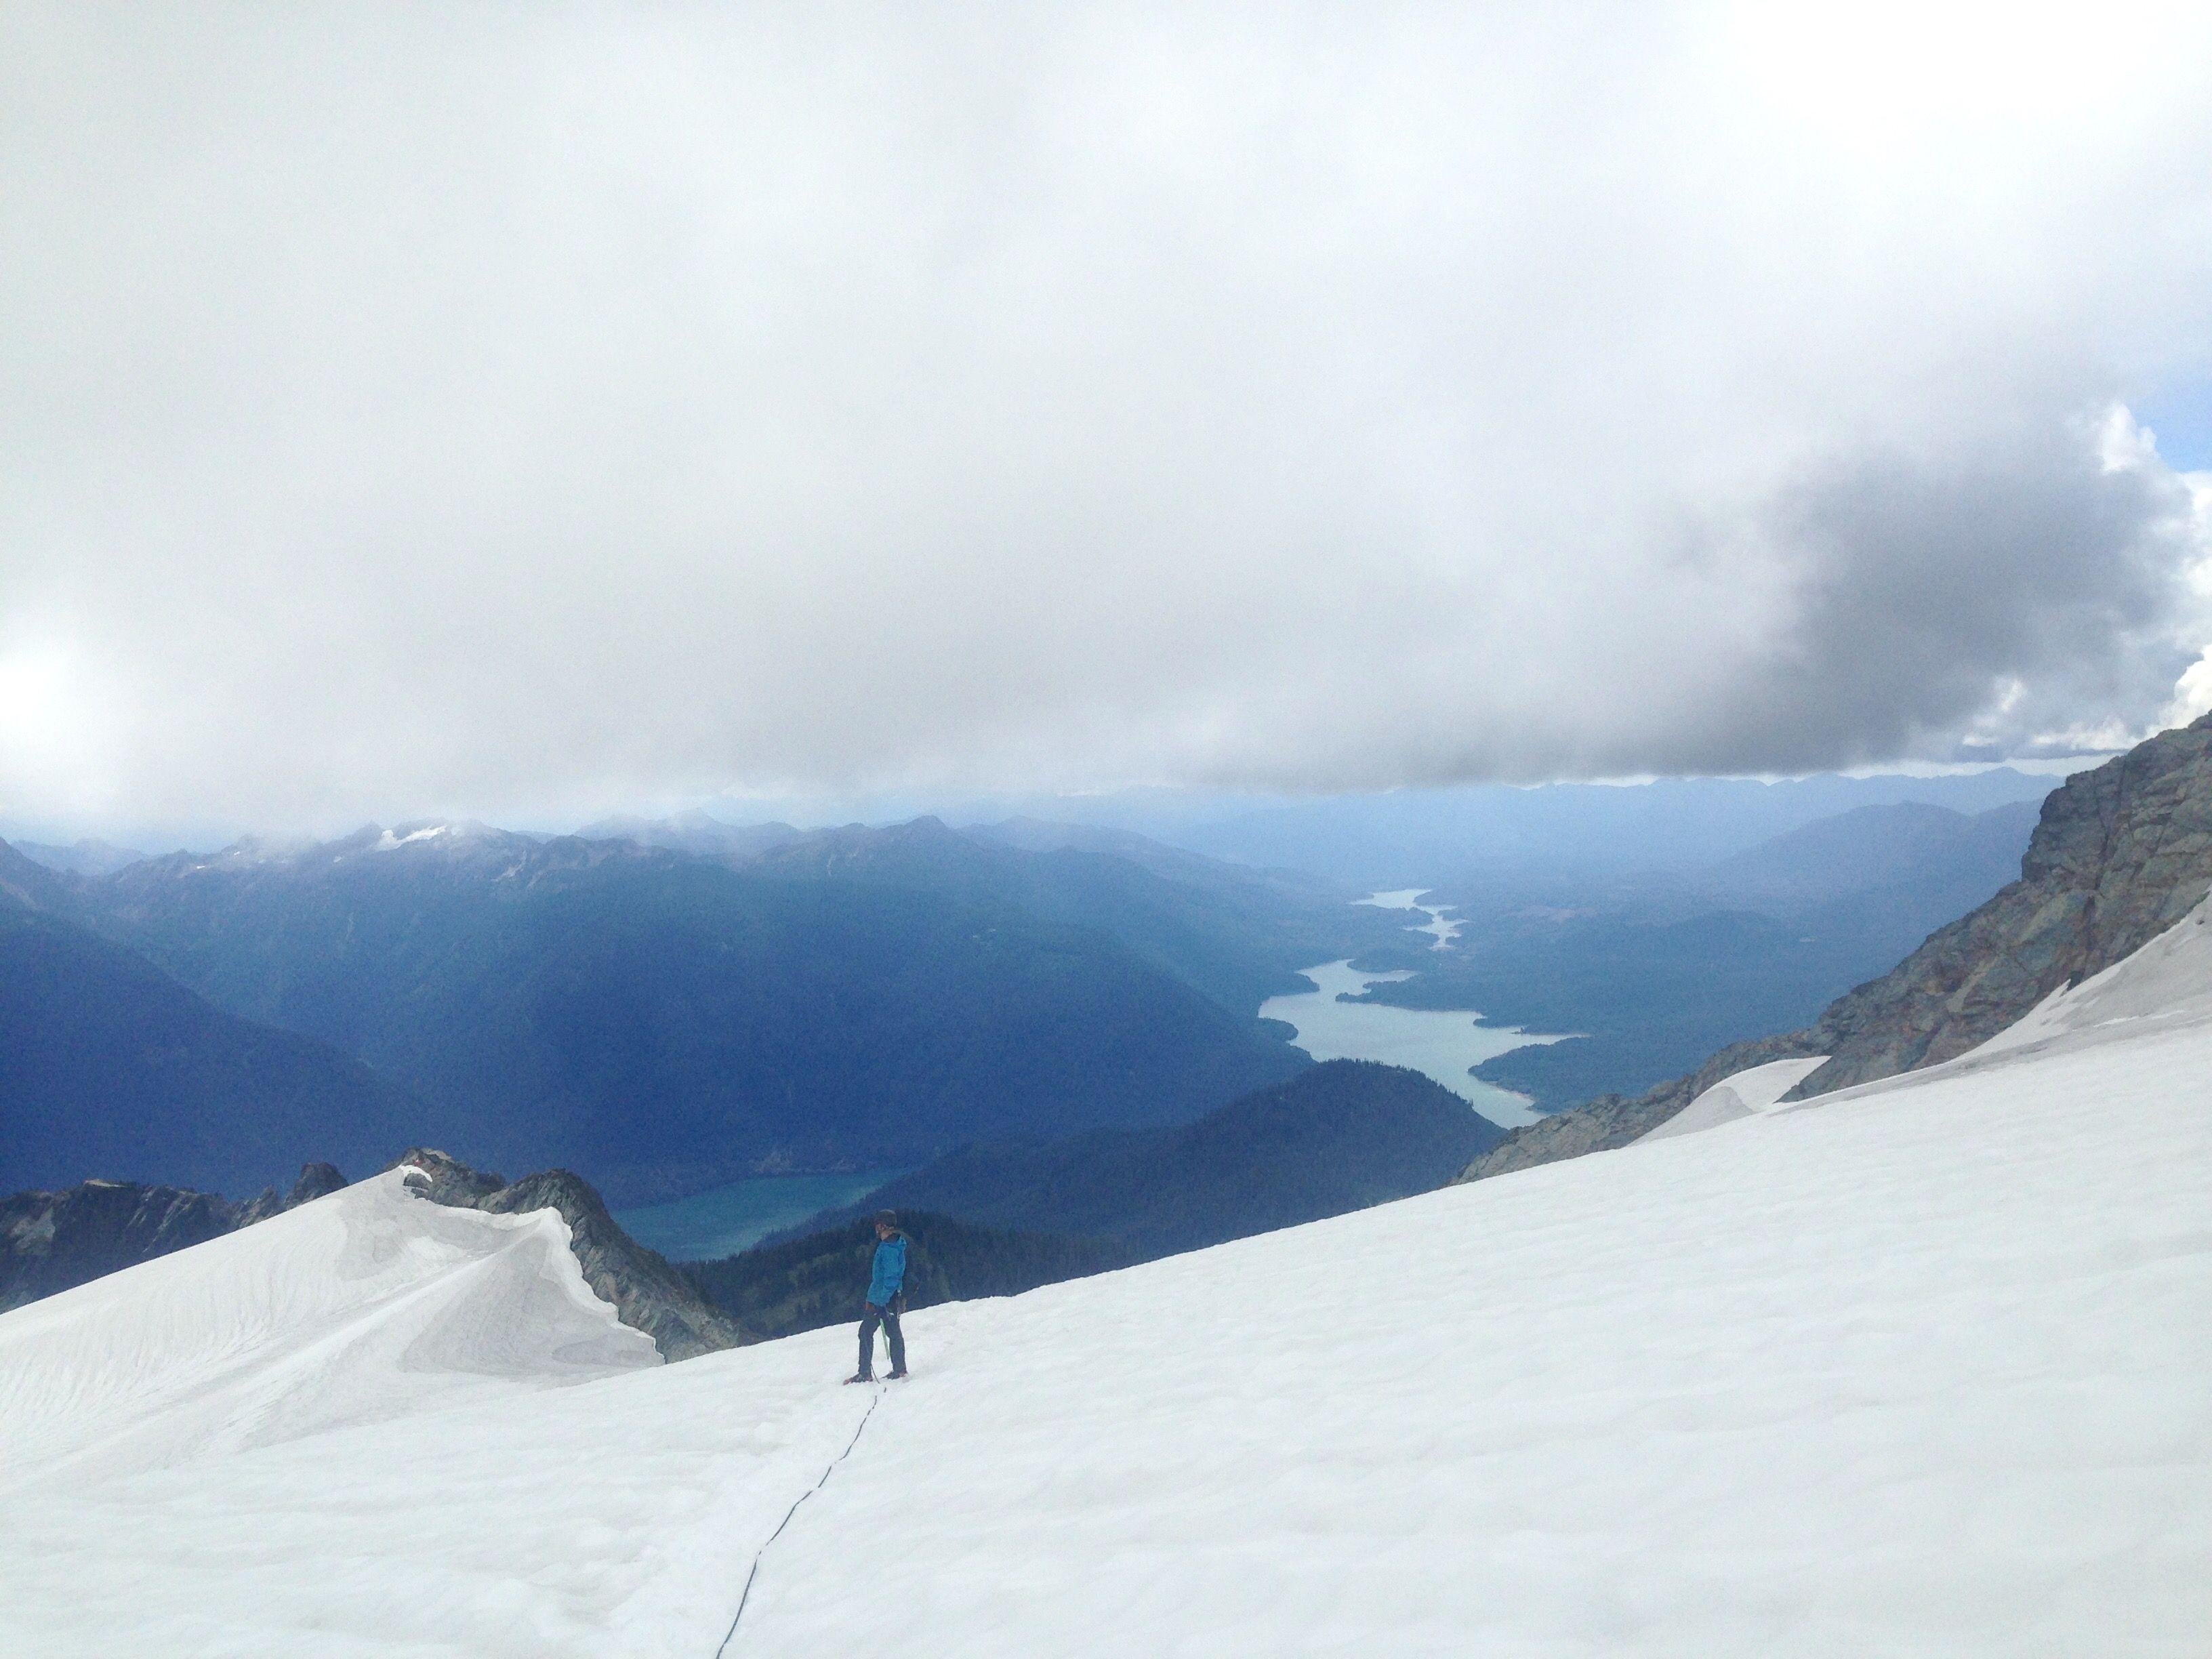 Descending Mt. Shuksan • North Cascades National Park